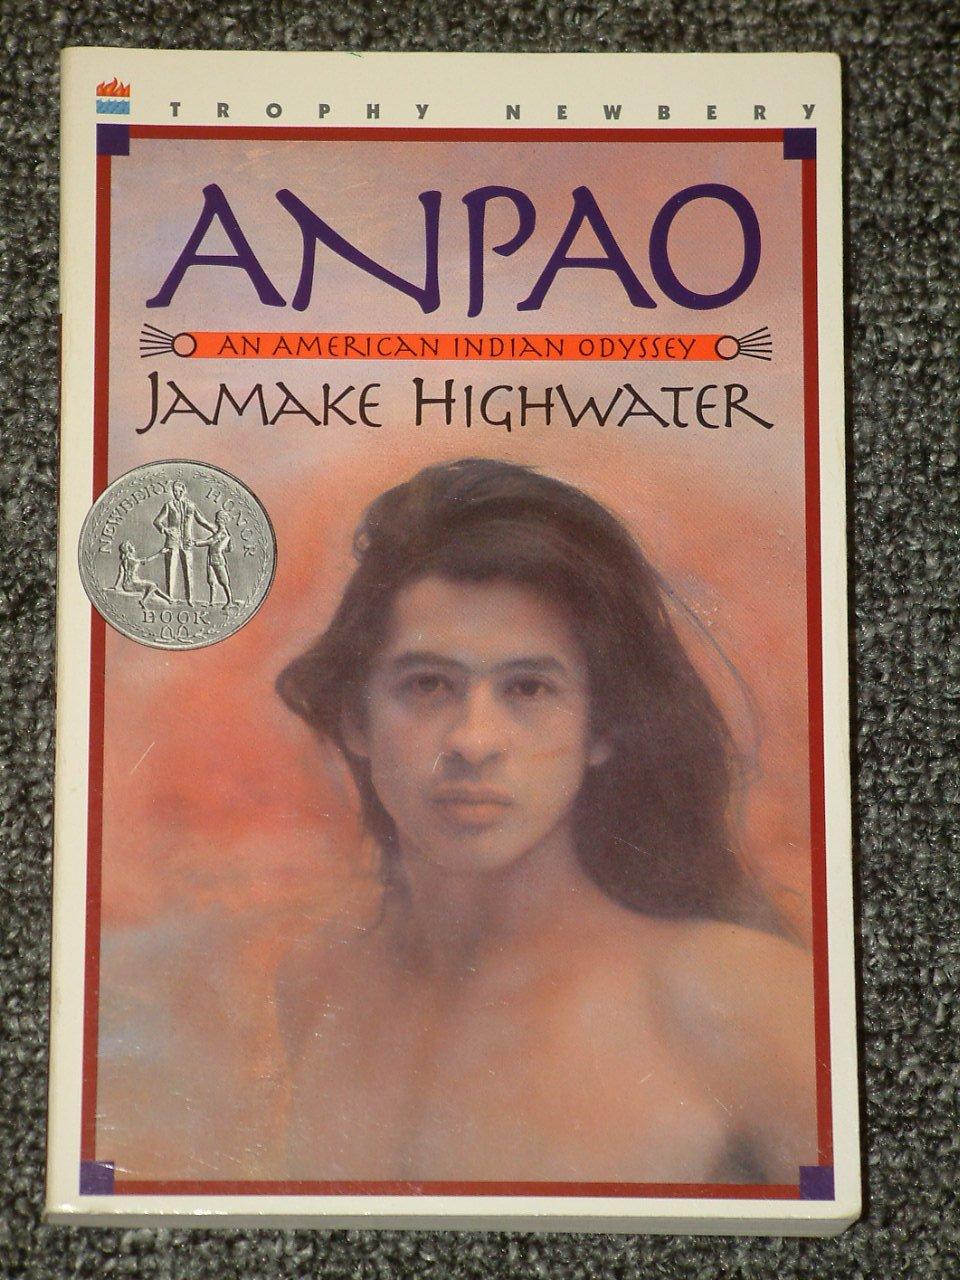 Anpao An American Indian Odyssey by Jamake Highwater Newbery Honor